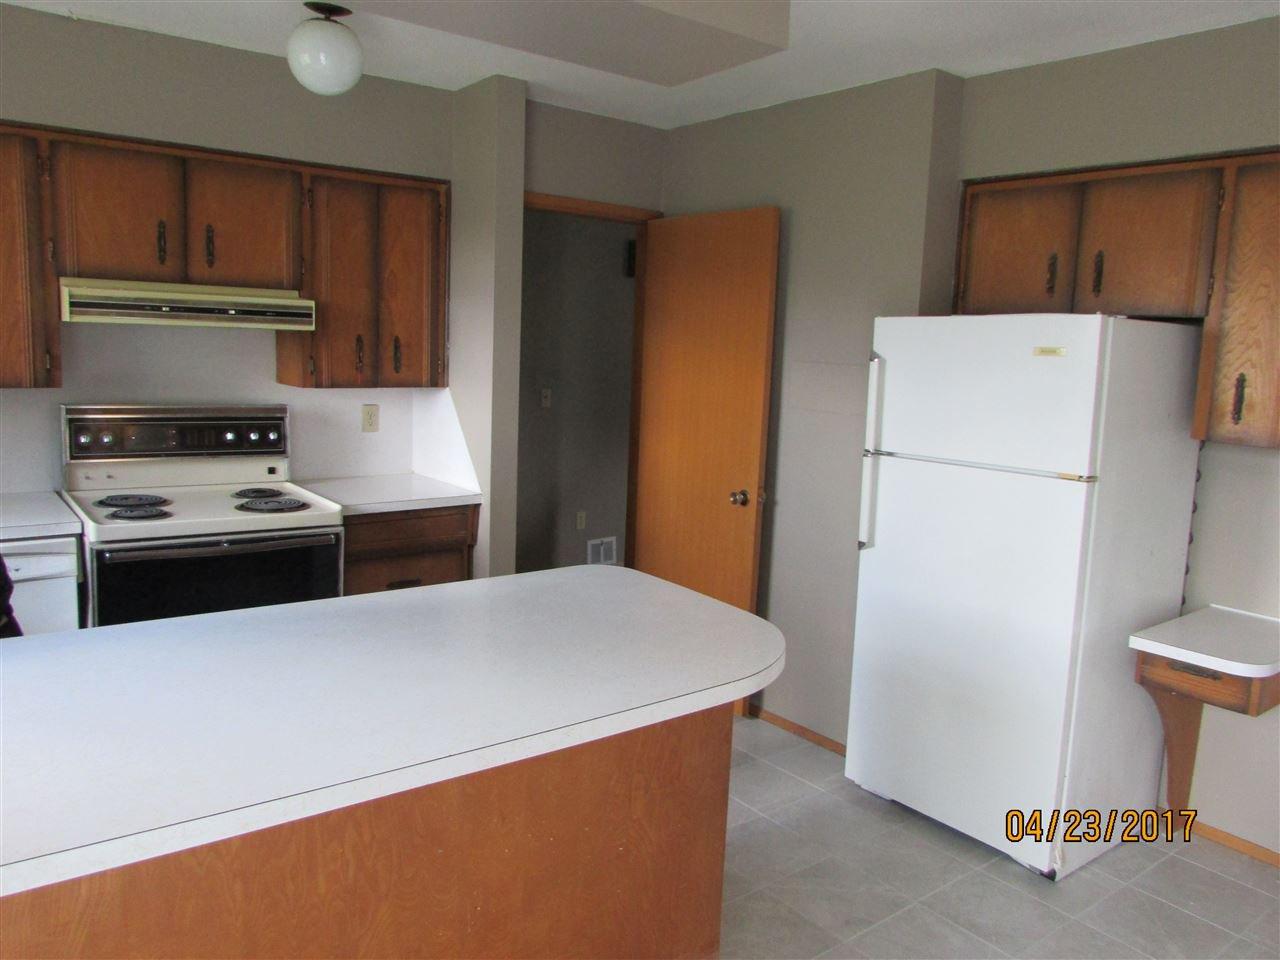 Photo 10: Photos: 7220 EVANS Road in Sardis: Sardis West Vedder Rd House for sale : MLS®# R2160379